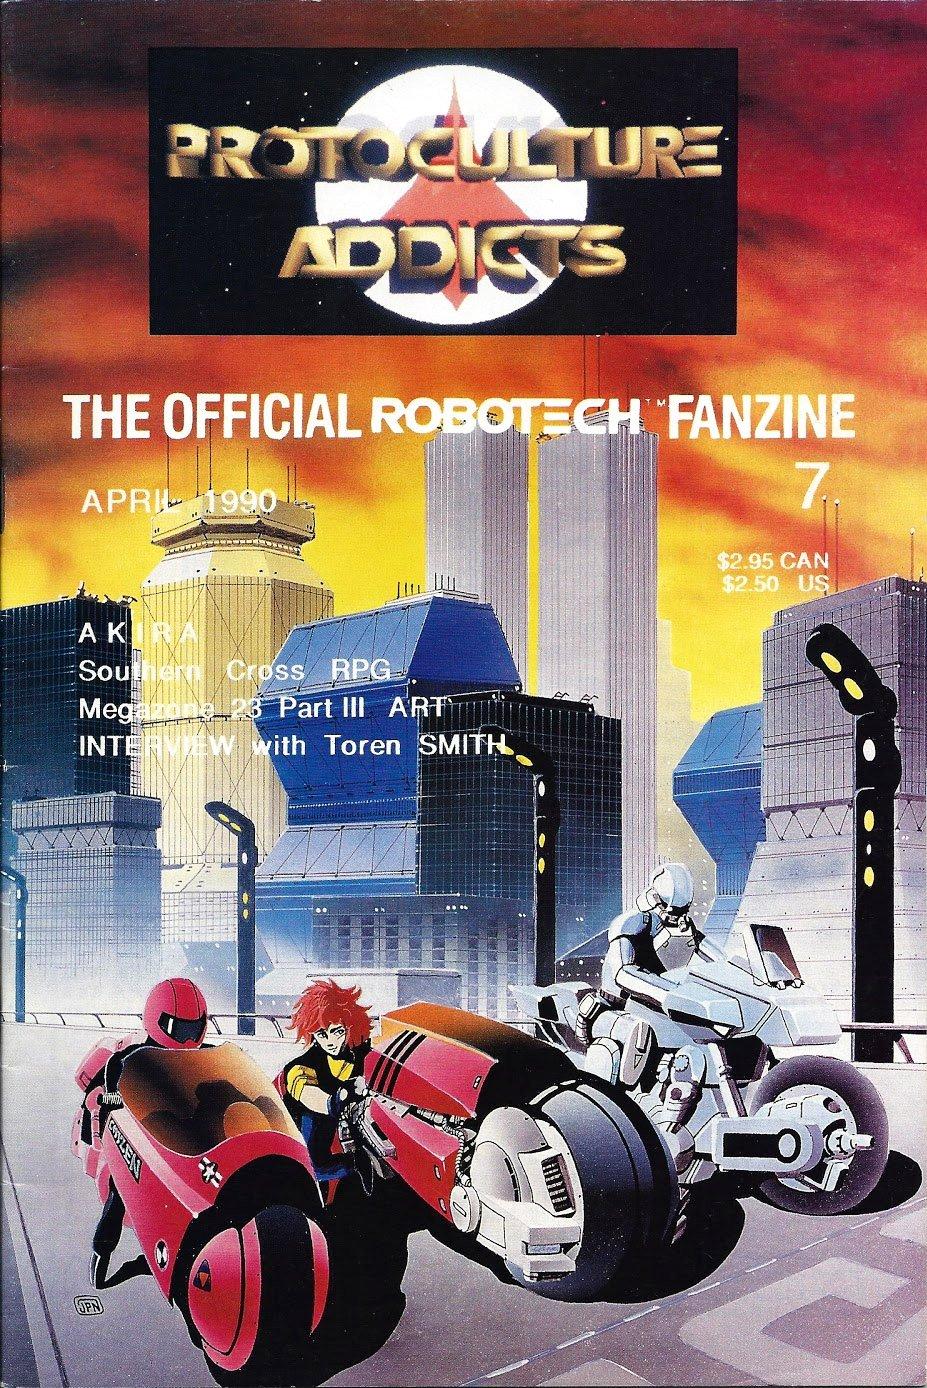 Protoculture Addicts Issue 07 (April 1990)